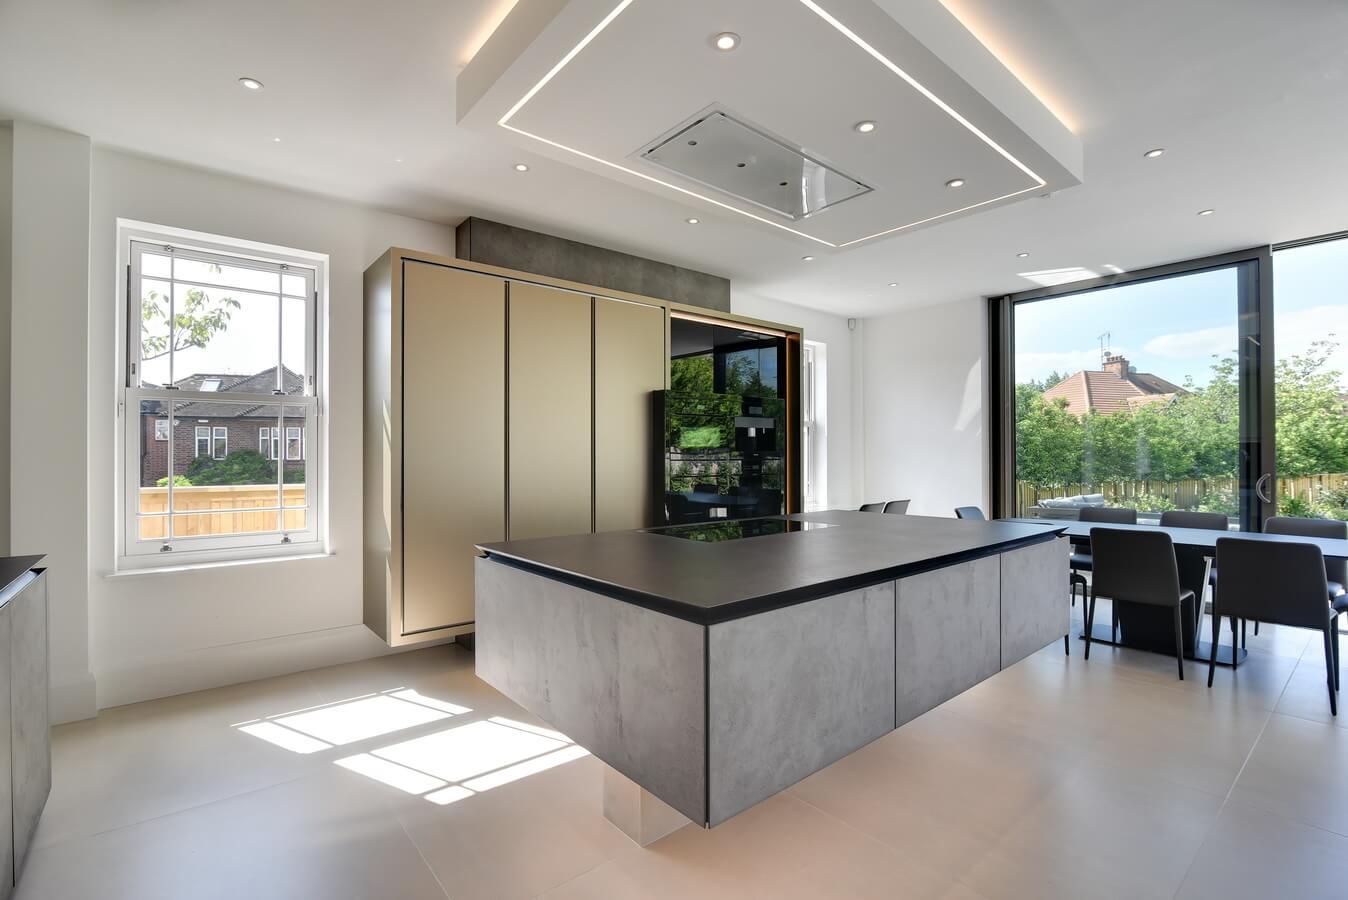 Warendorf-kitchen-Finchley-North-London-Grey-Aluminium.jpg